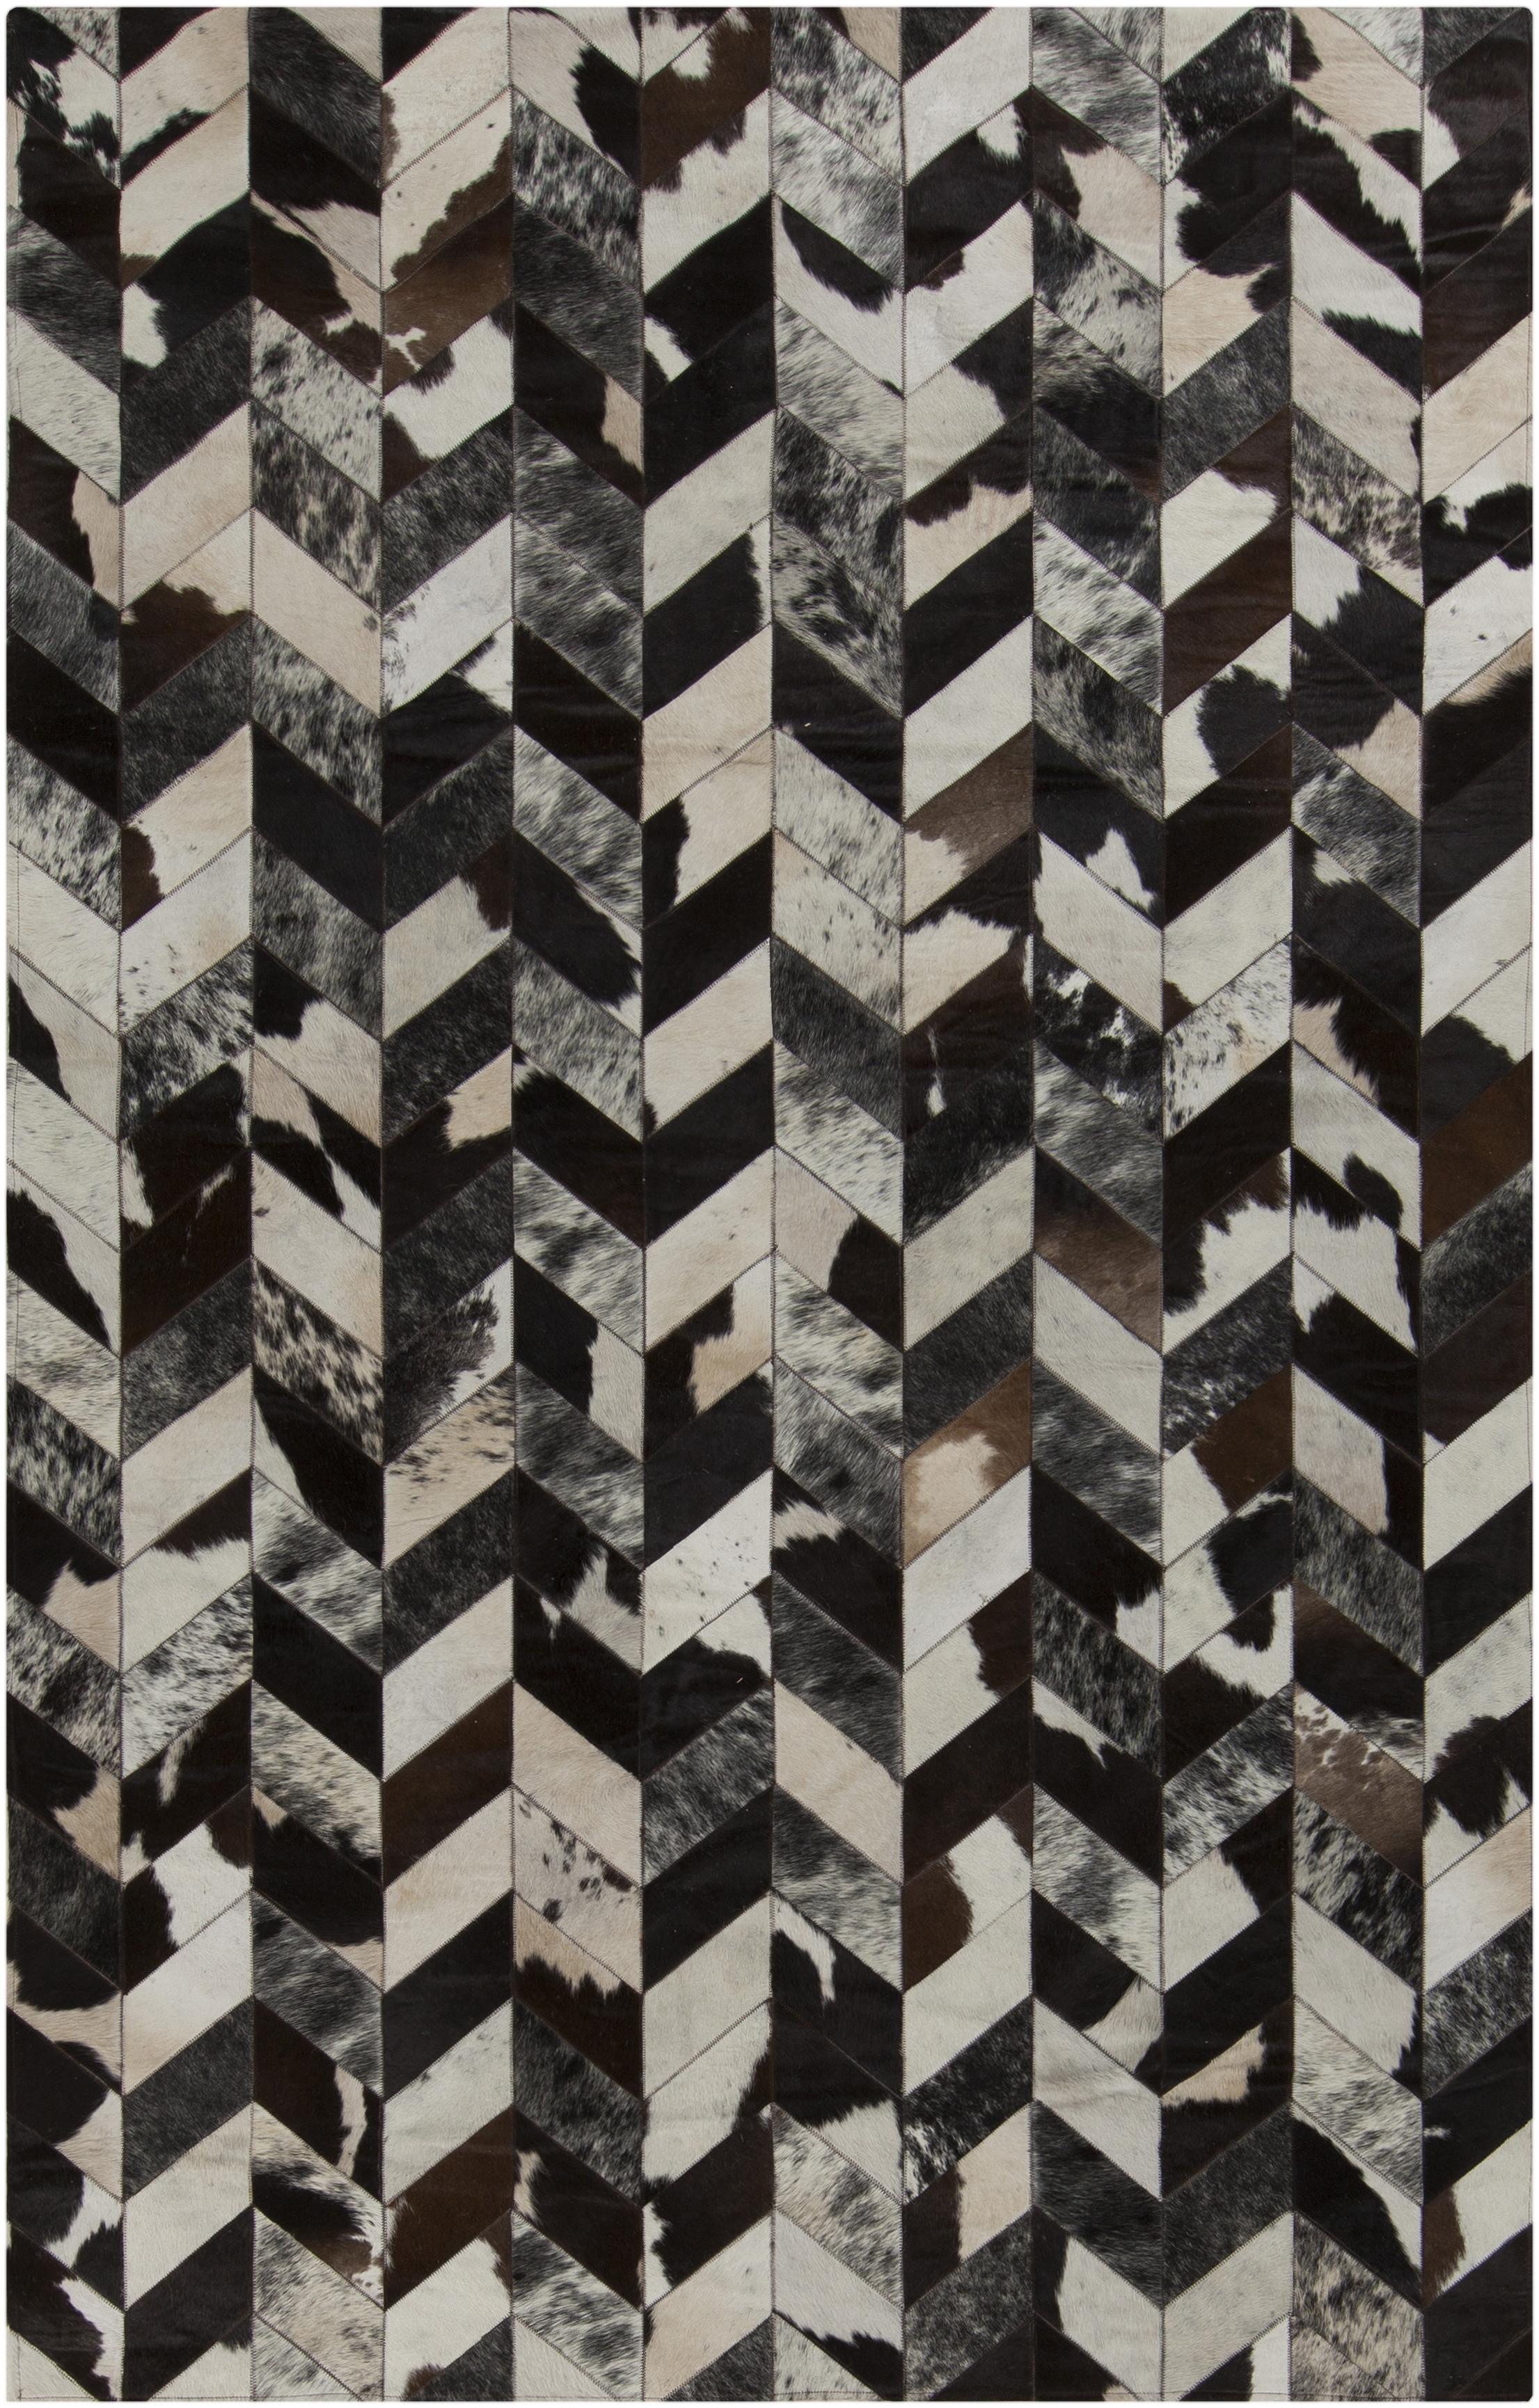 Appalachian 5' x 8' by Surya at Wayside Furniture